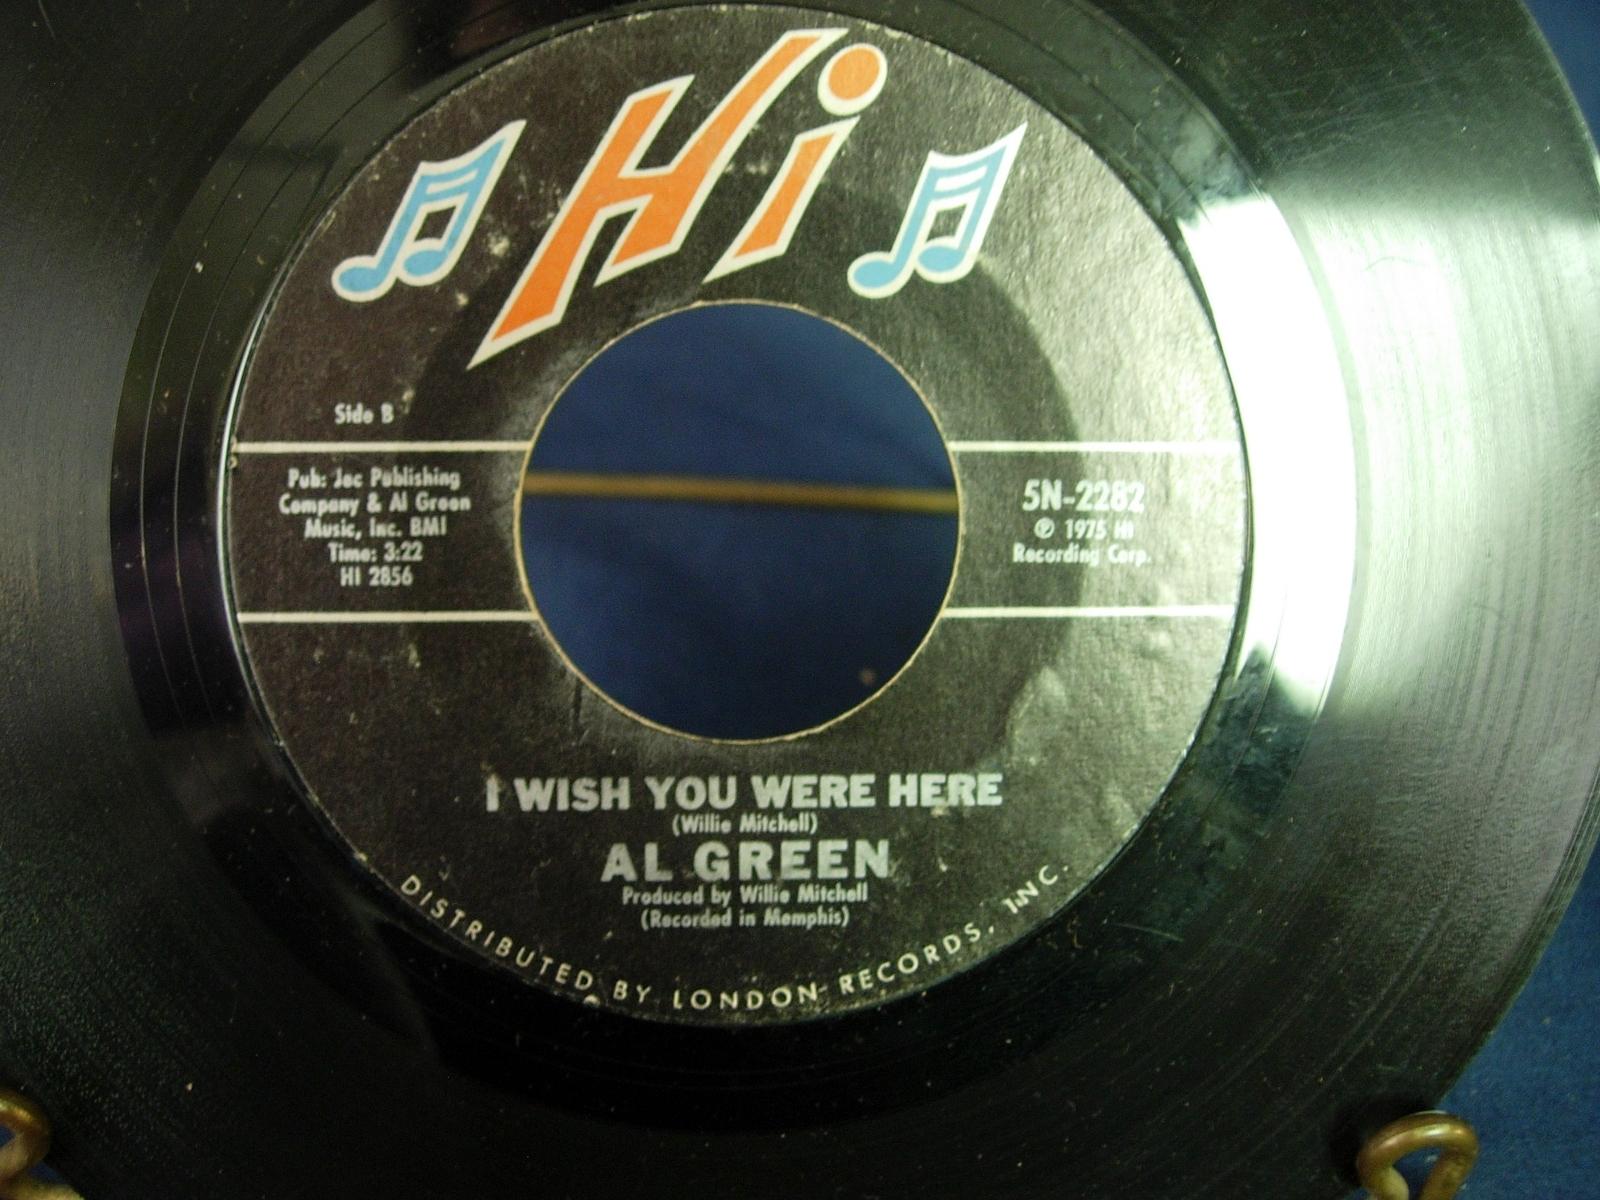 AL GREEN ~ L-O-V-E / I Wish You Were Here - Hi Records 5N-2282